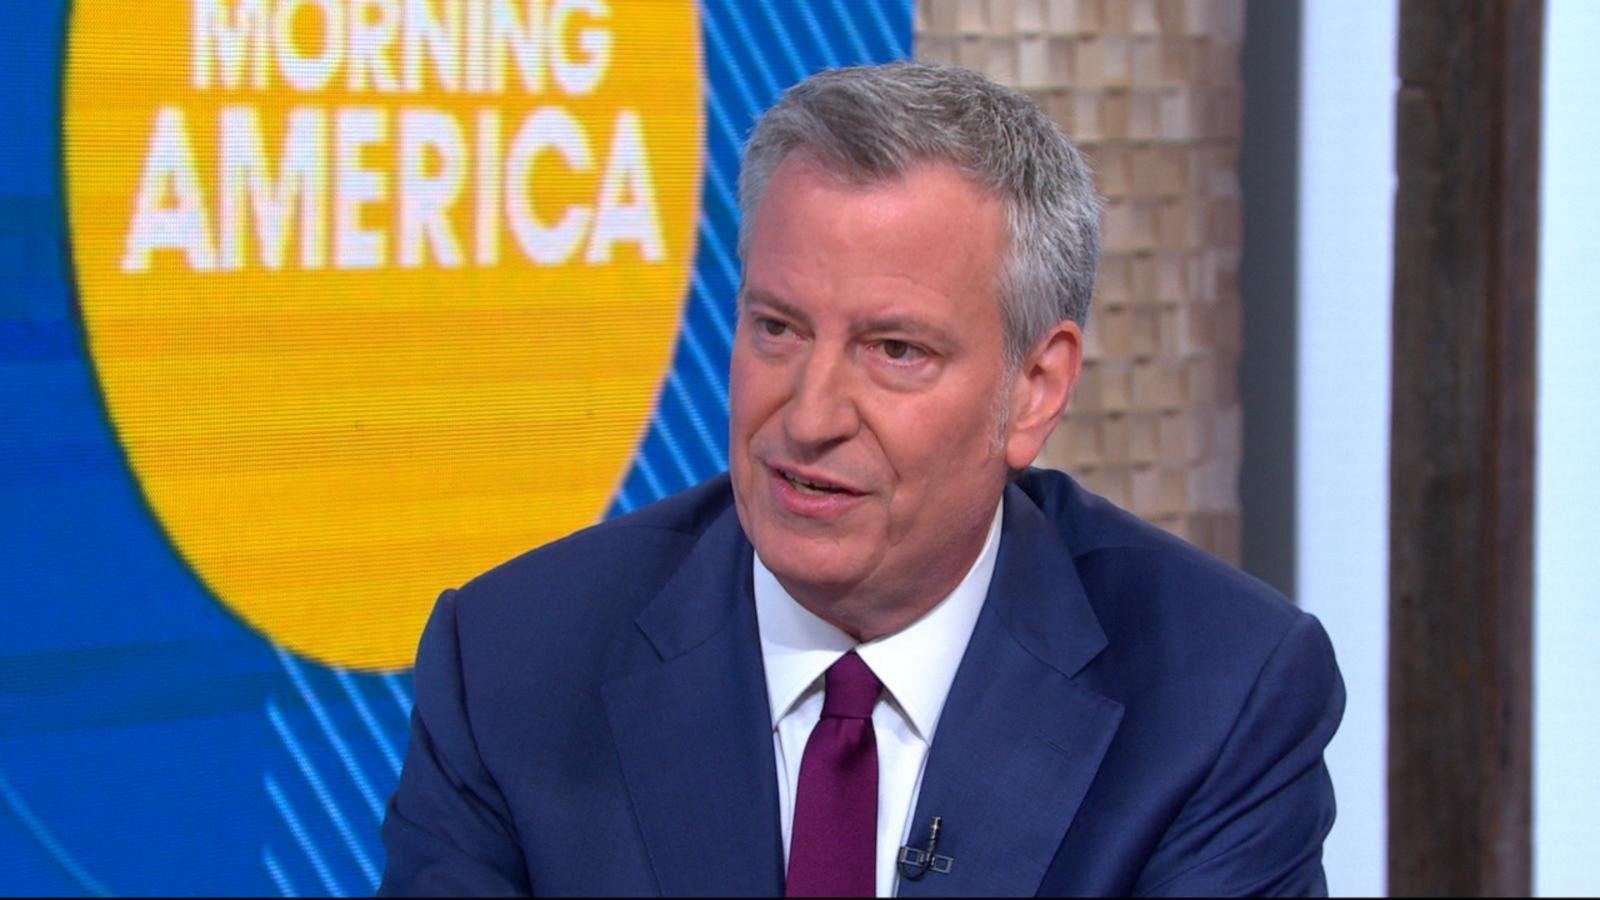 Best After Christmas Sales 2020 New York City Mayor Bill de Blasio announces 2020 presidential bid